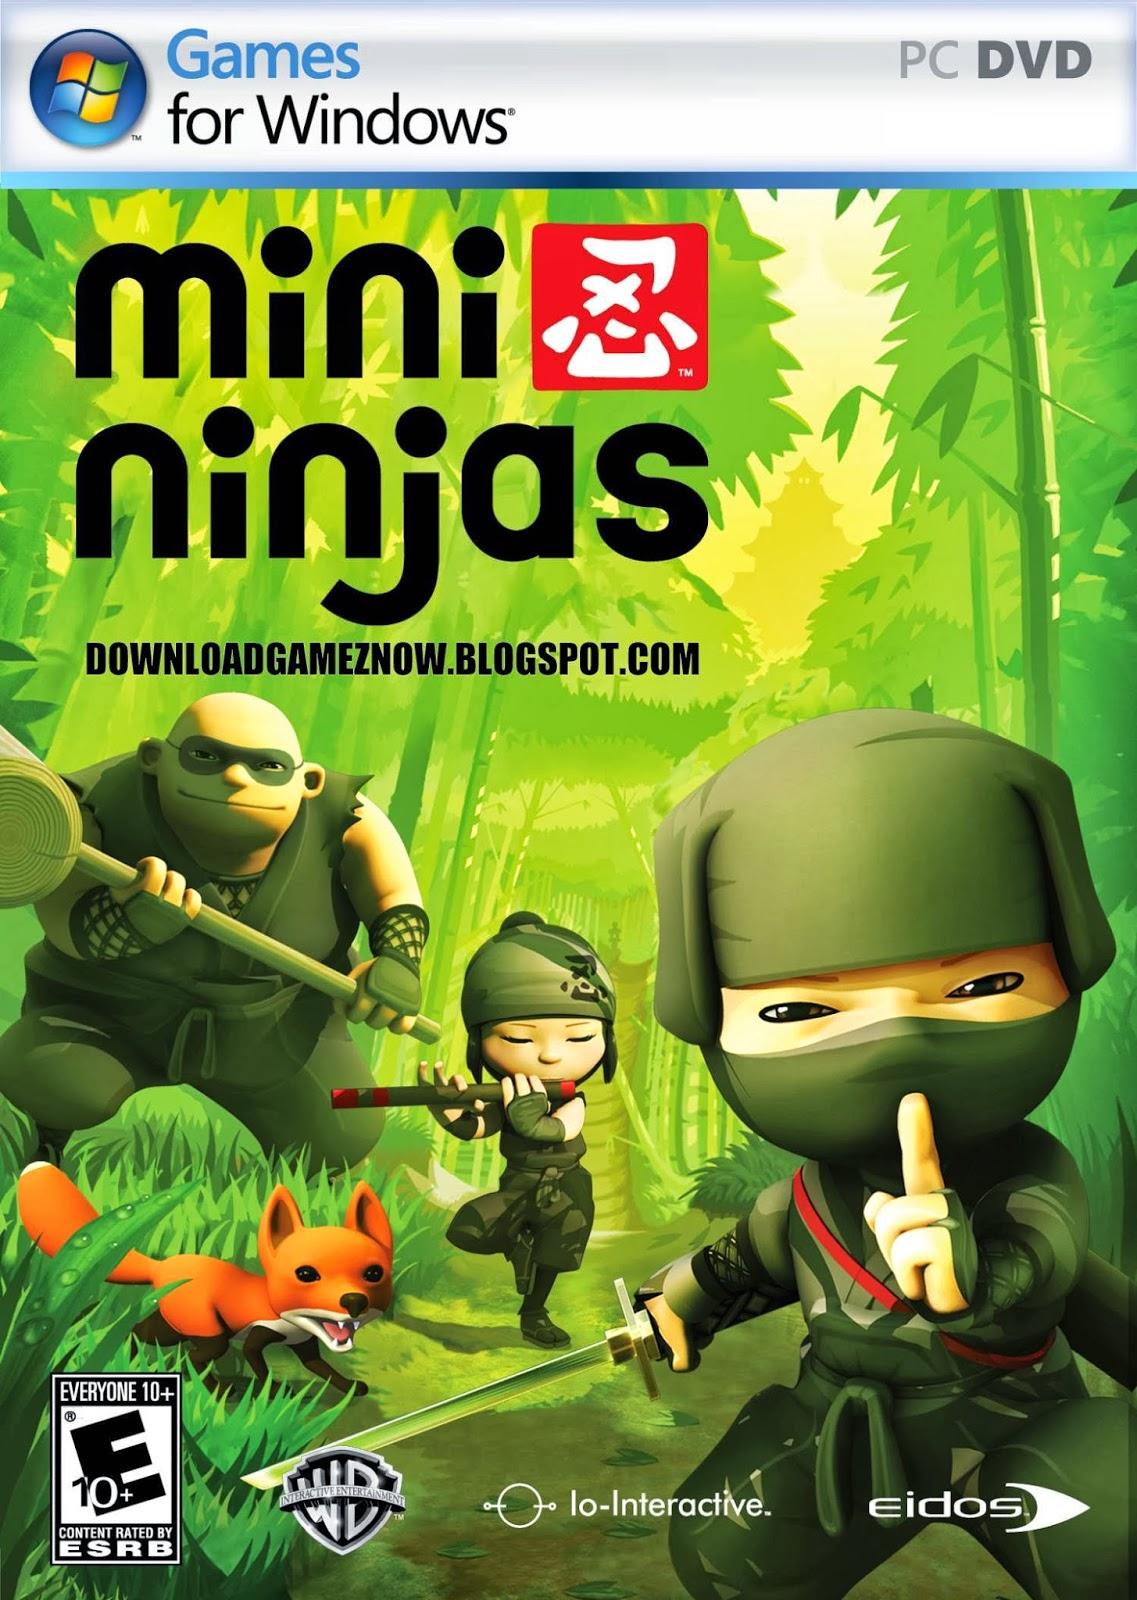 Download Free Games - Free PC Game - Full Version Games